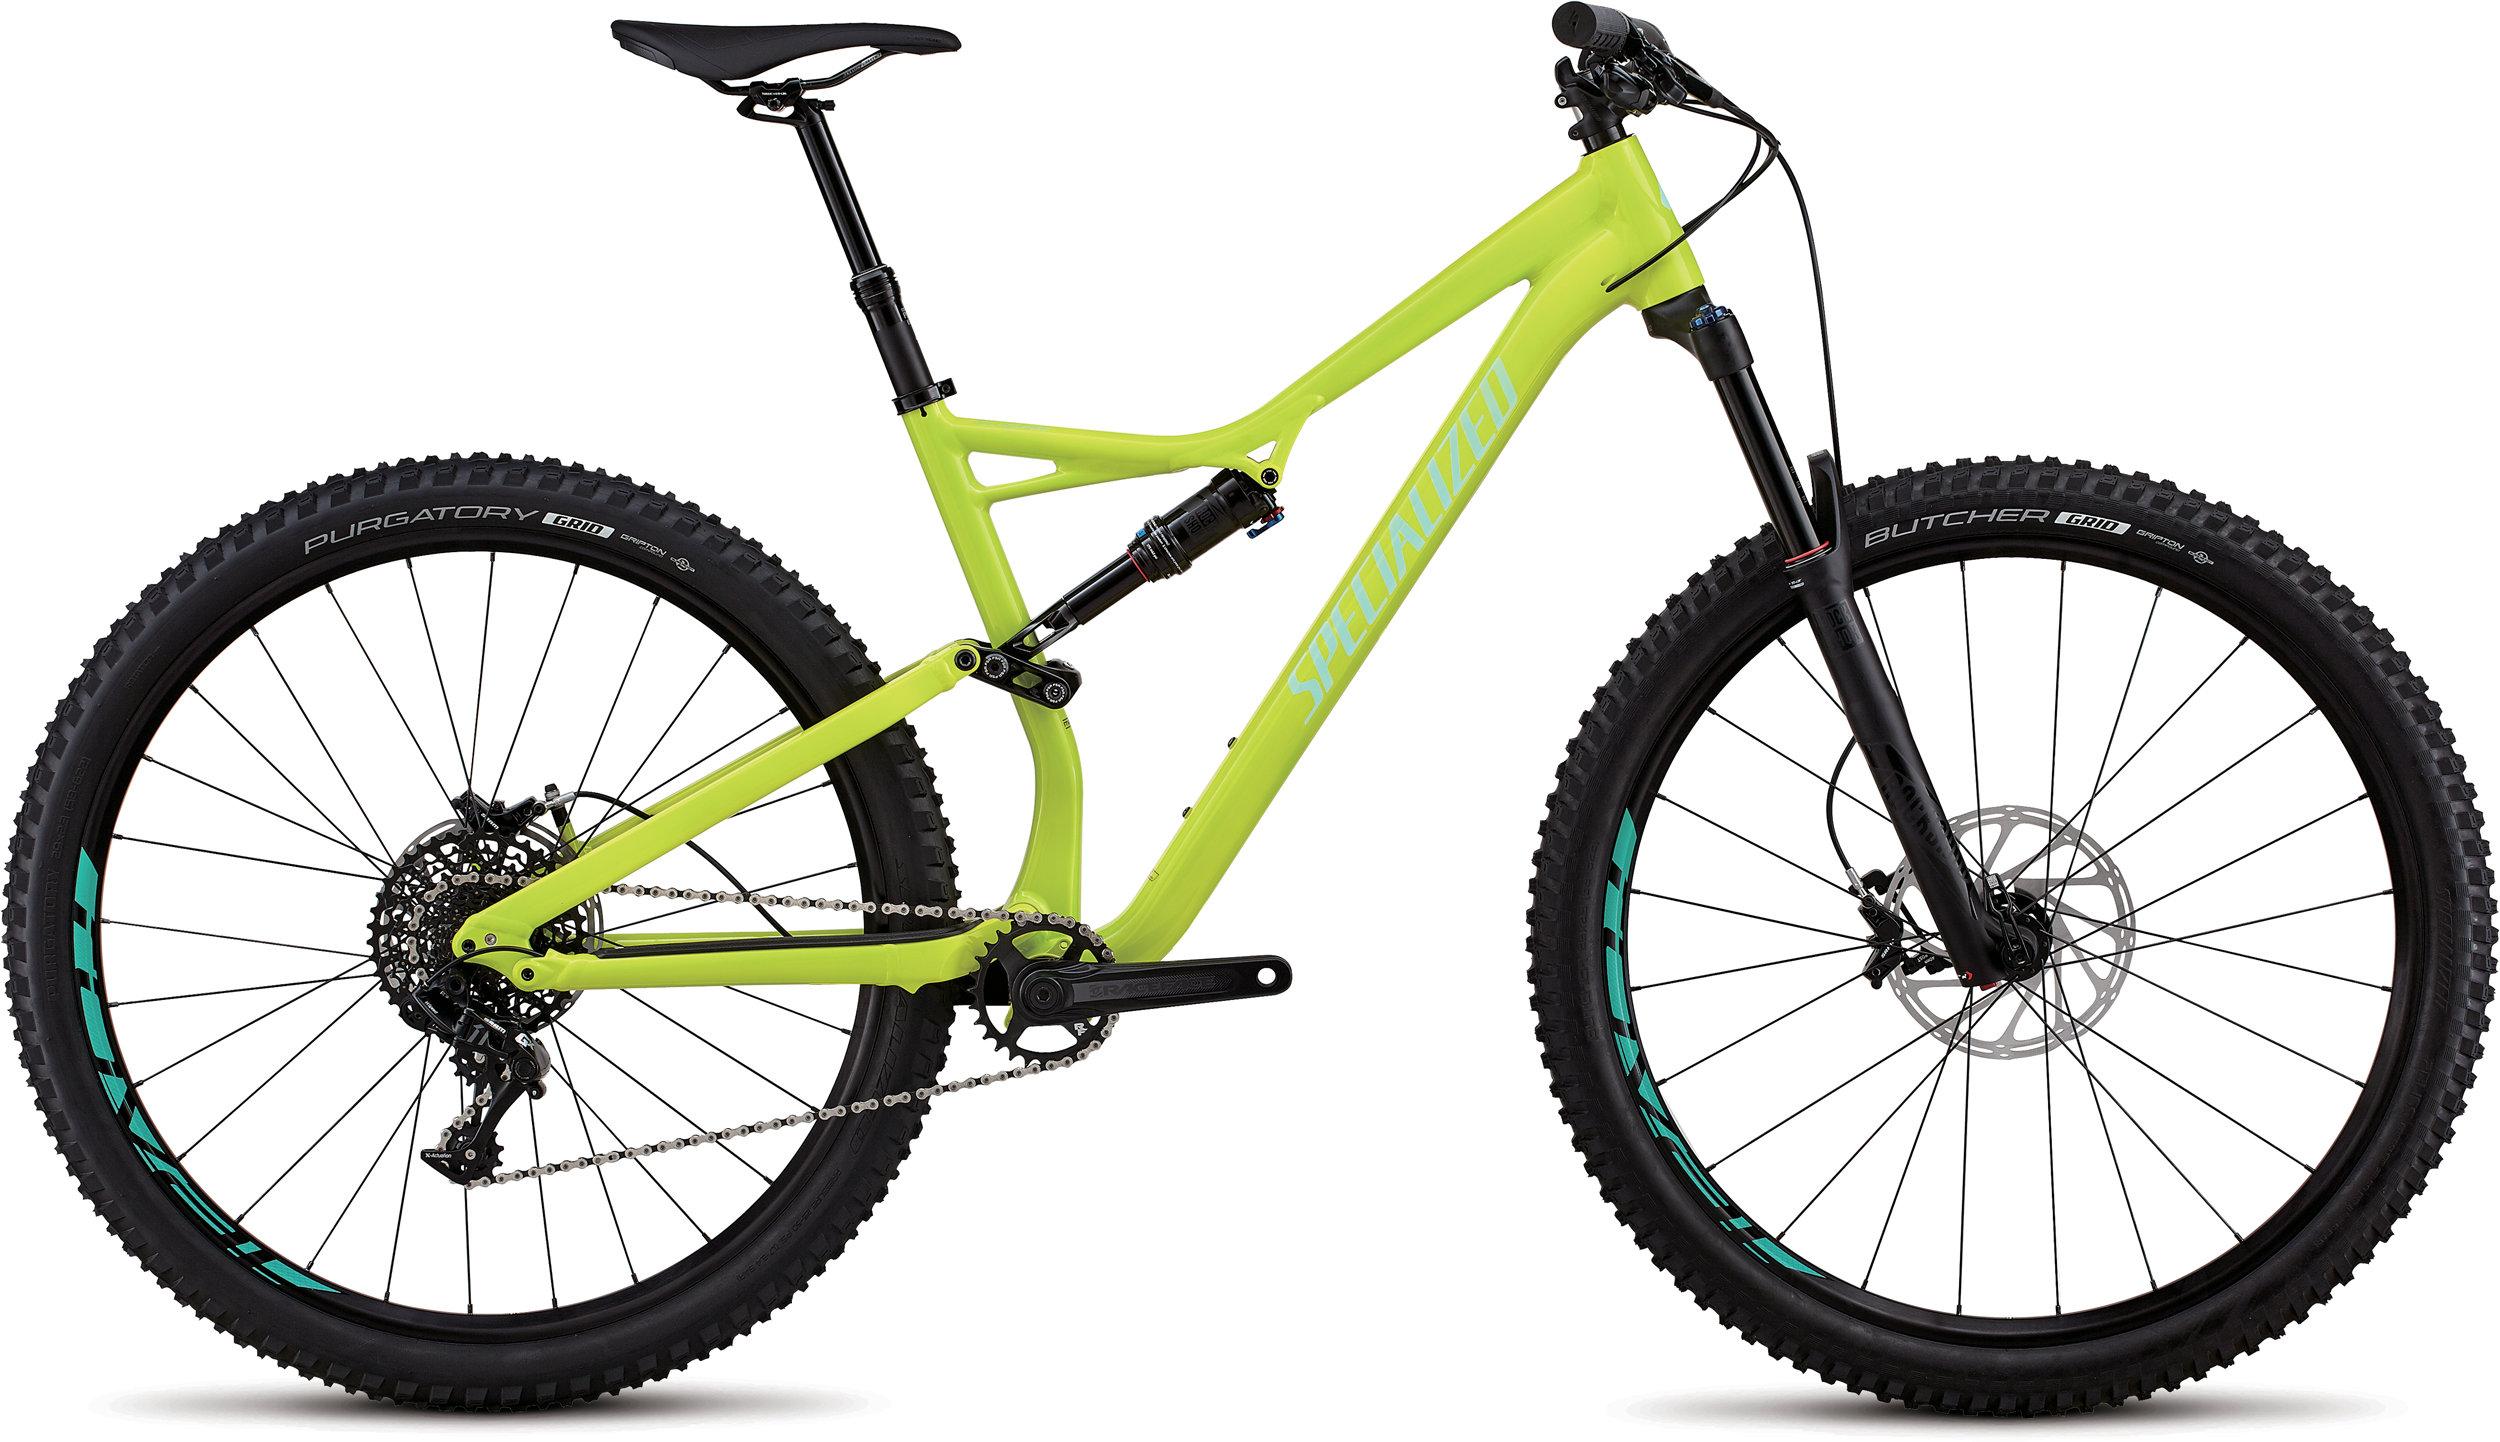 Specialized Stumpjumper Comp Alloy 29/6Fattie GLOSS HYPER / MINT CLEAN S - Bike Maniac